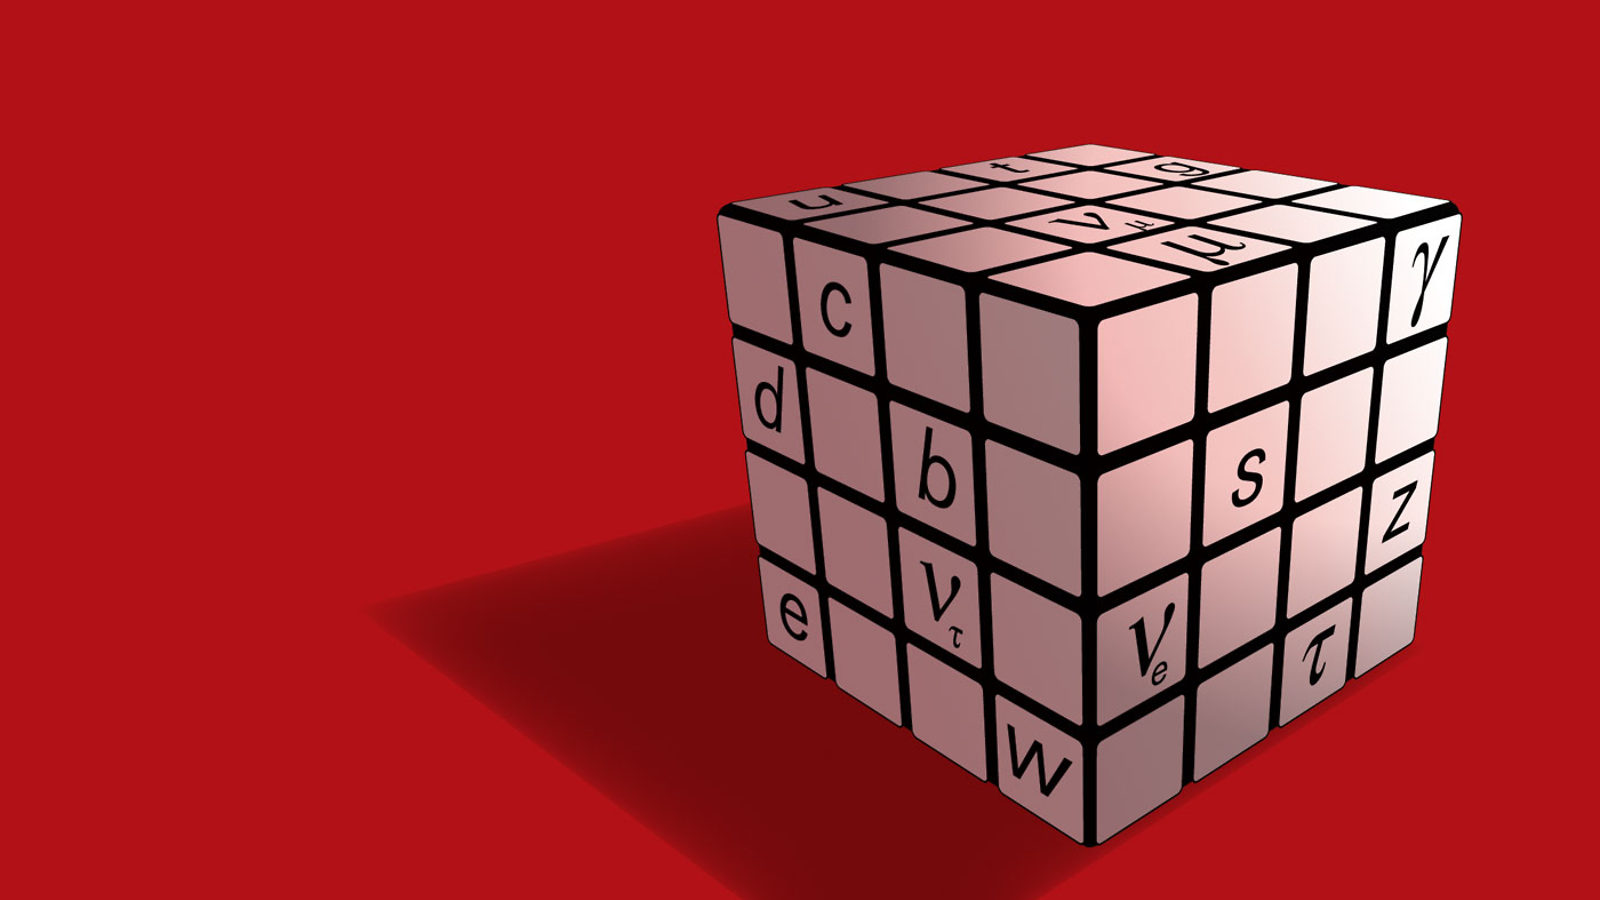 Illustration of Standard Model Cube